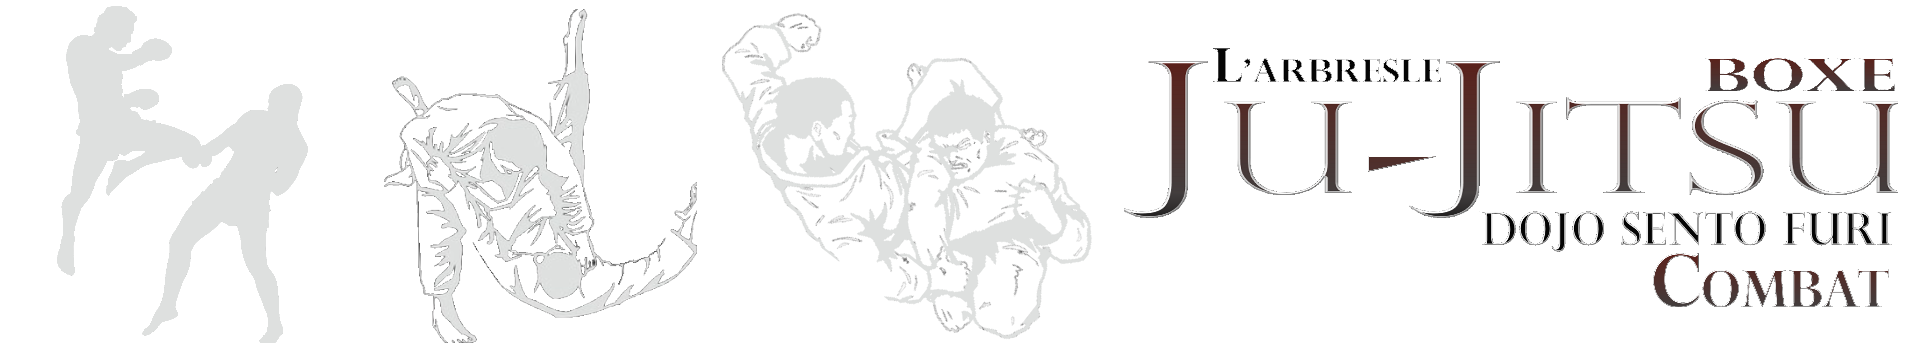 Ju-Jitsu Combat L'Arbresle